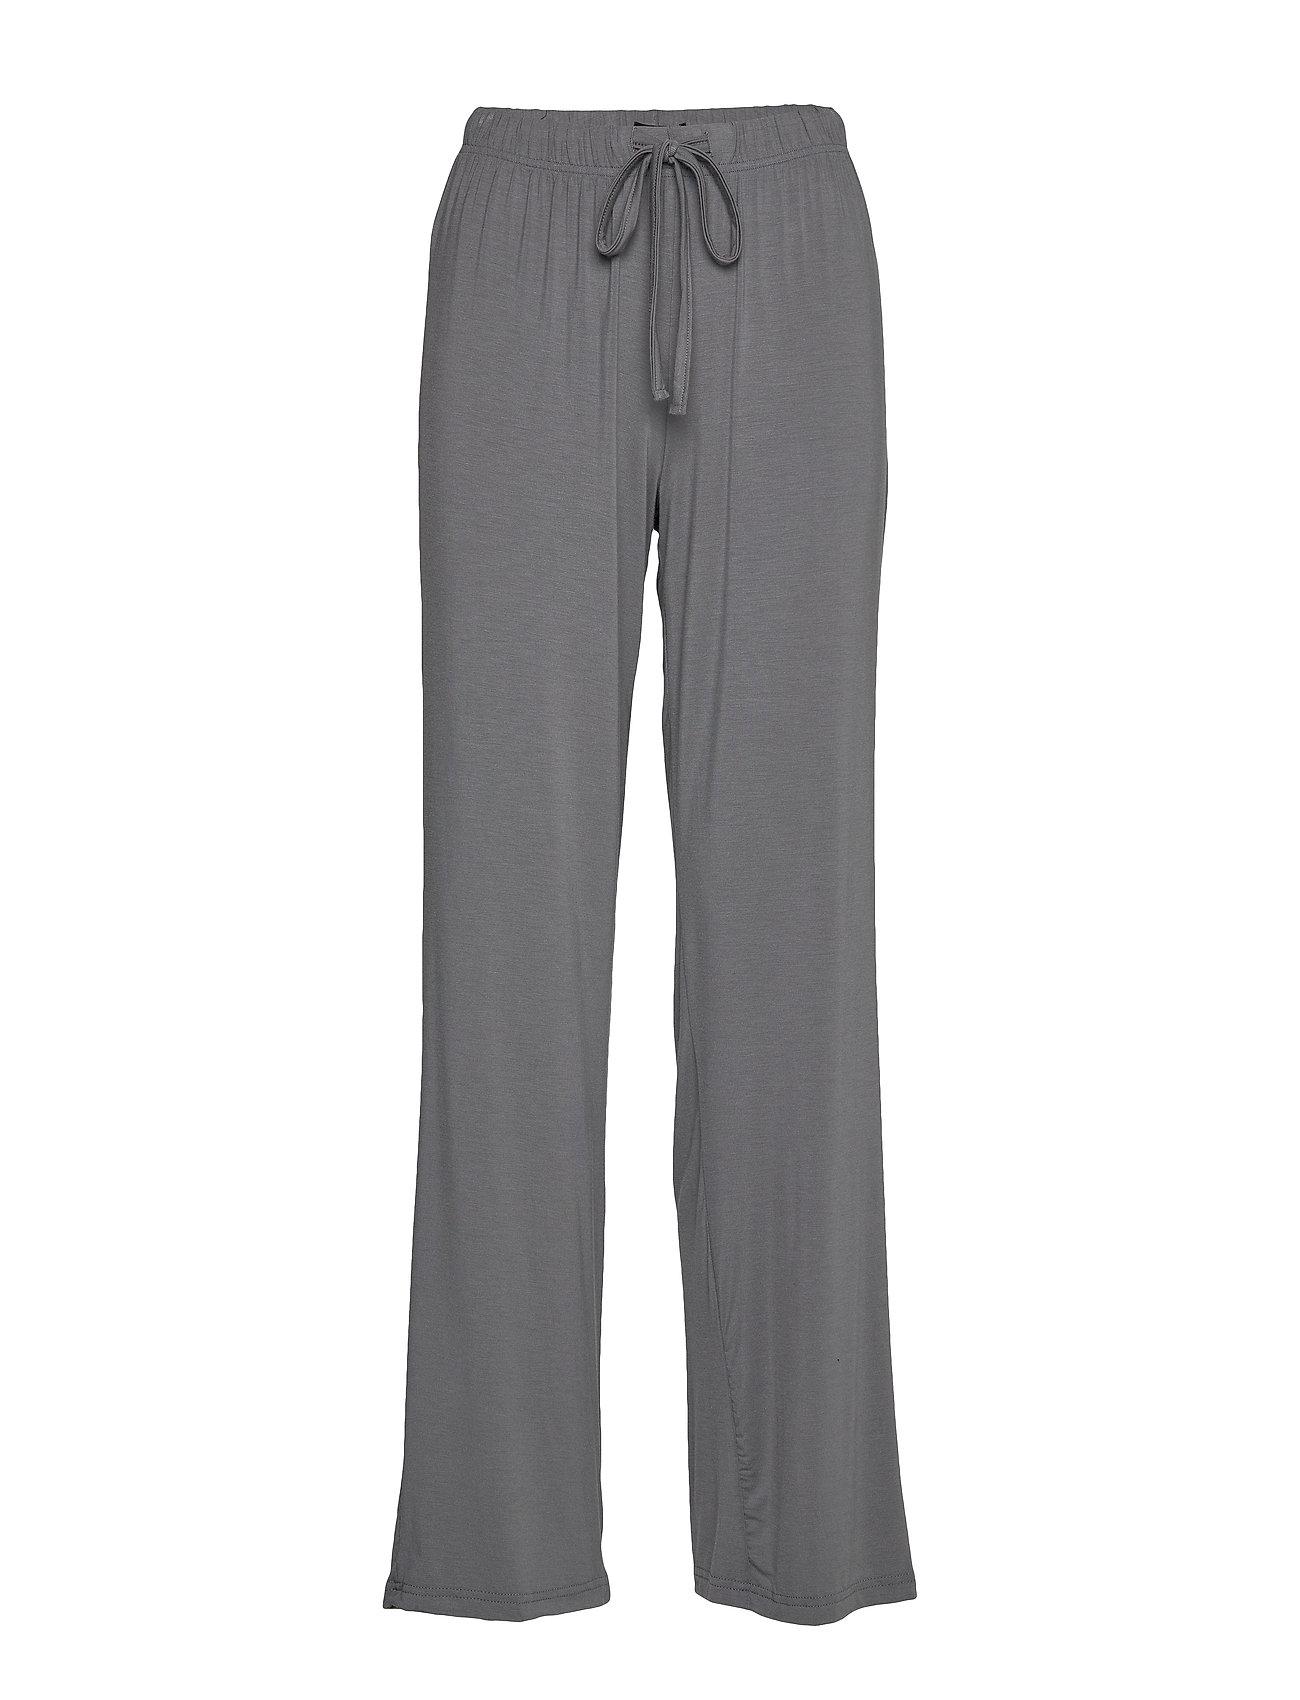 Missya Softness wide pant - STEEL GREY